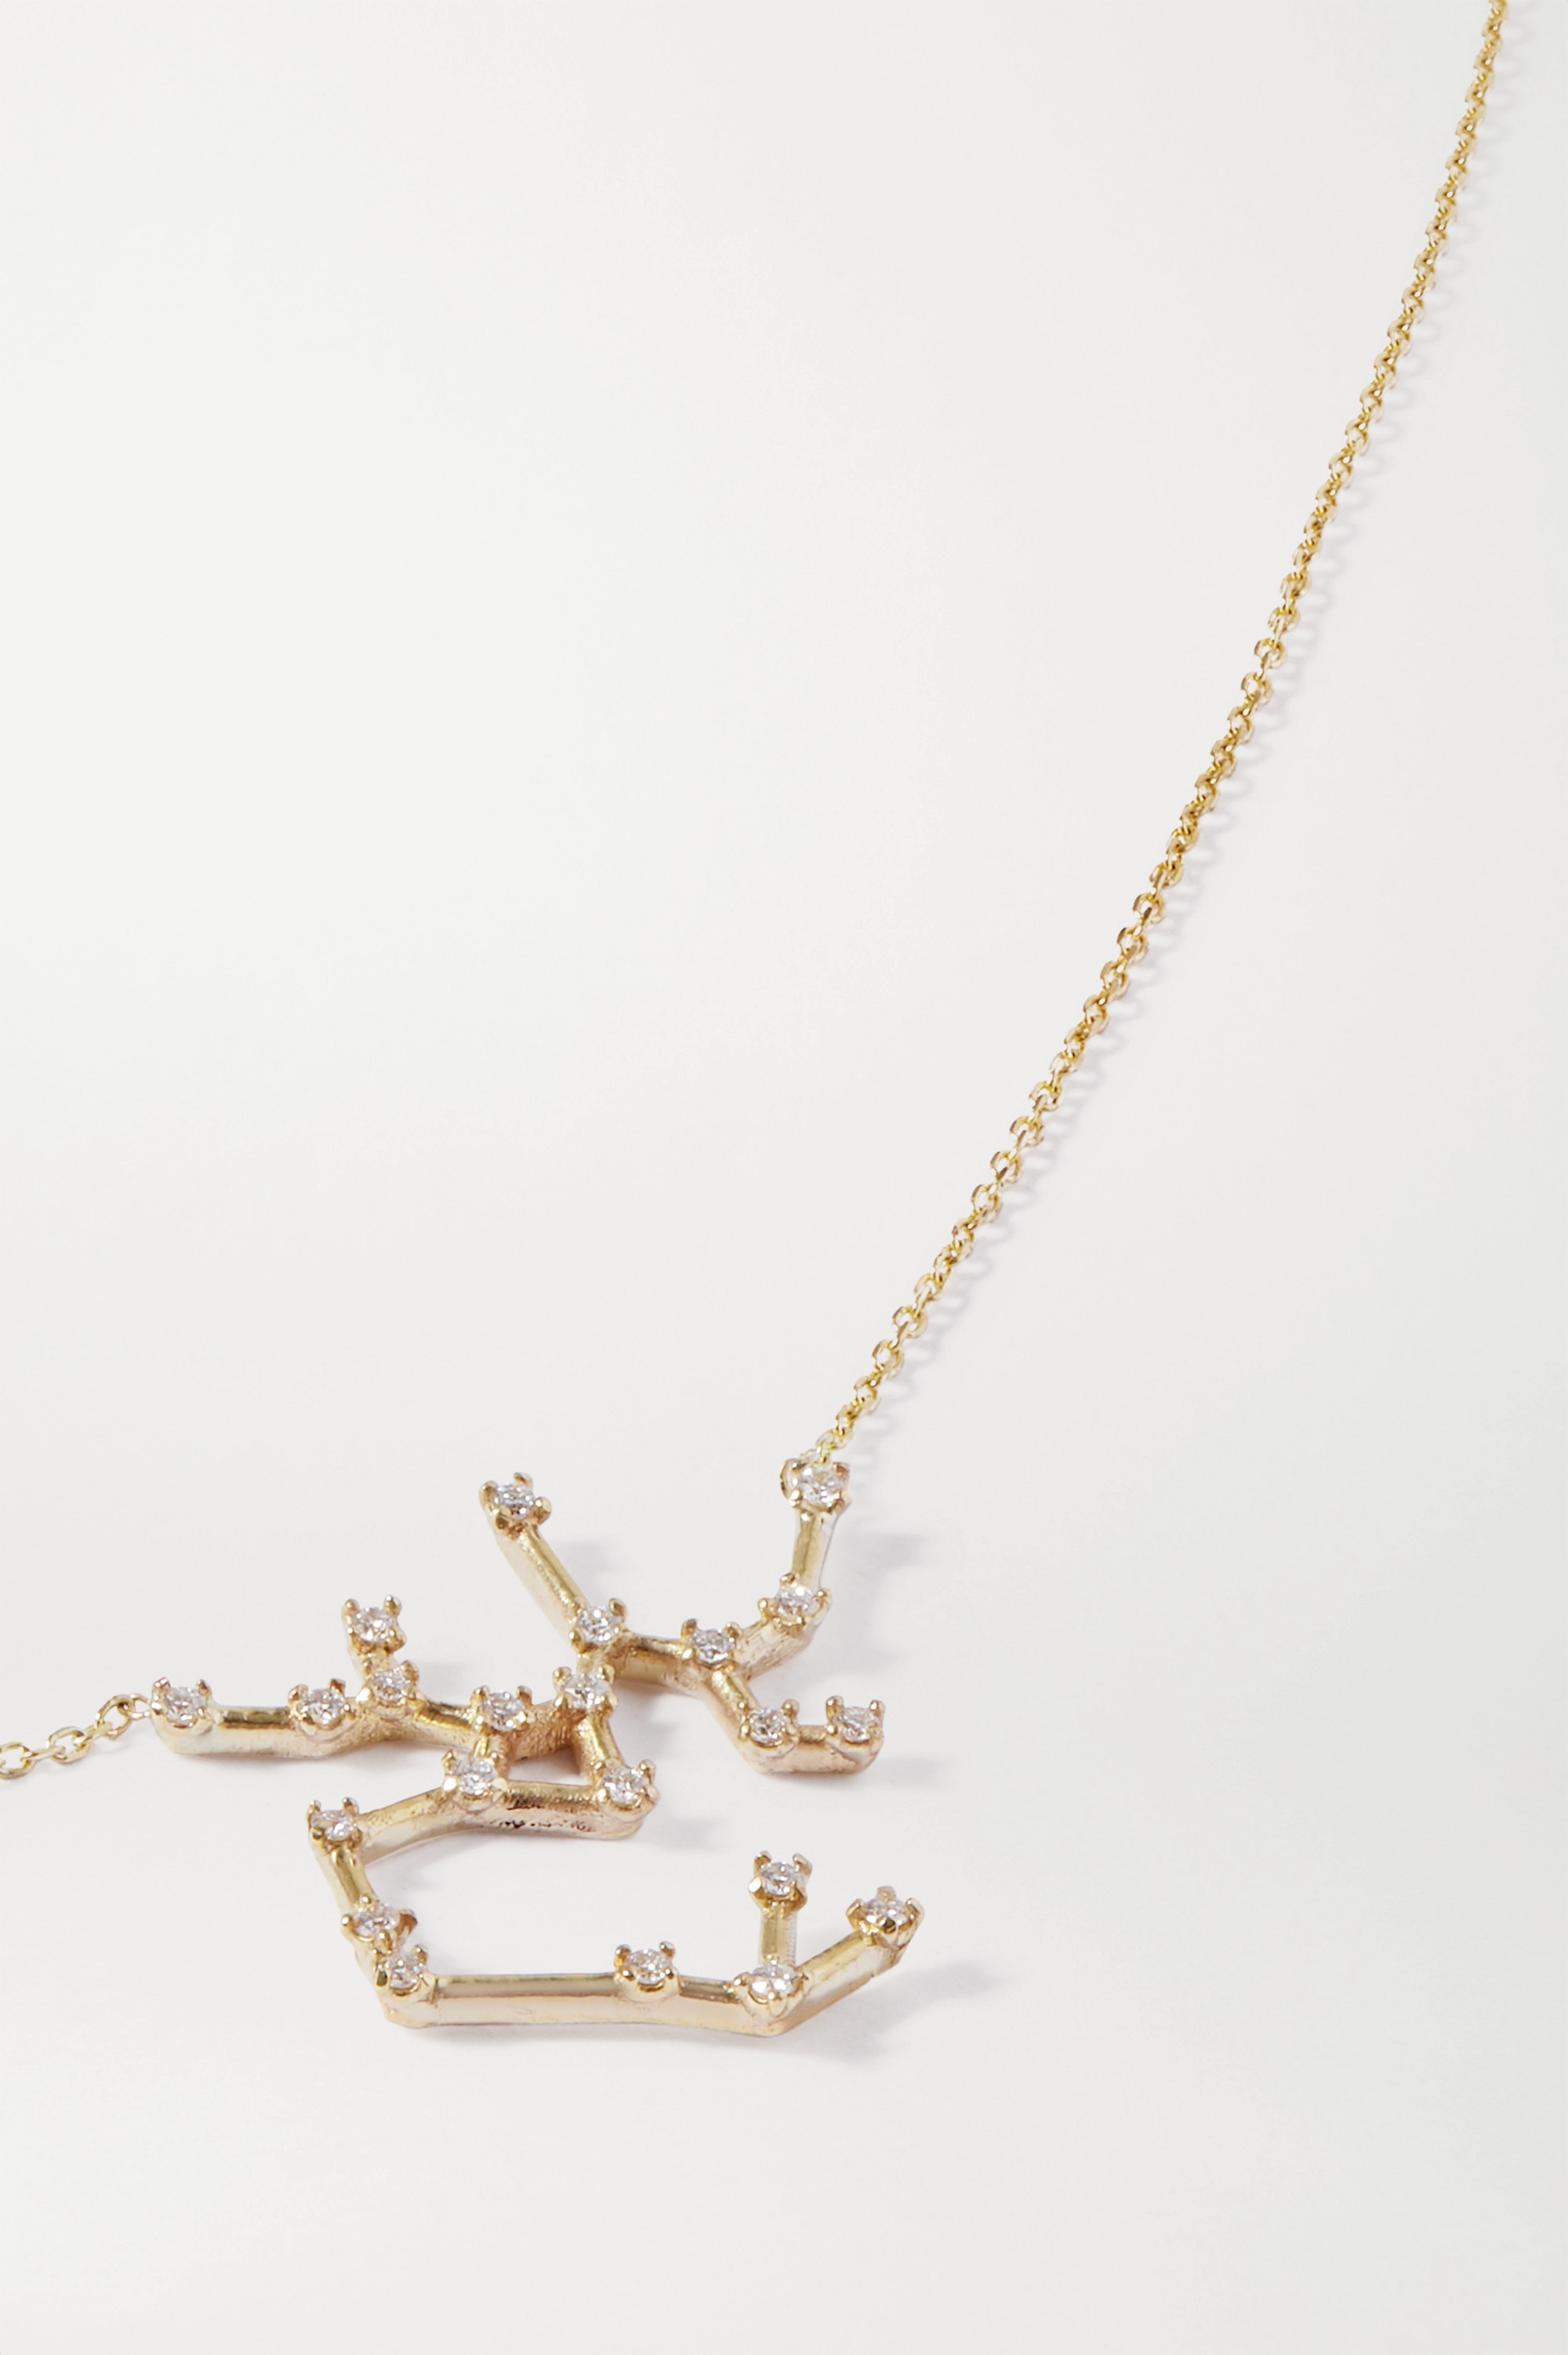 SARAH & SEBASTIAN Celestial Sagittarius Kette aus 10 Karat Gold mit Diamanten